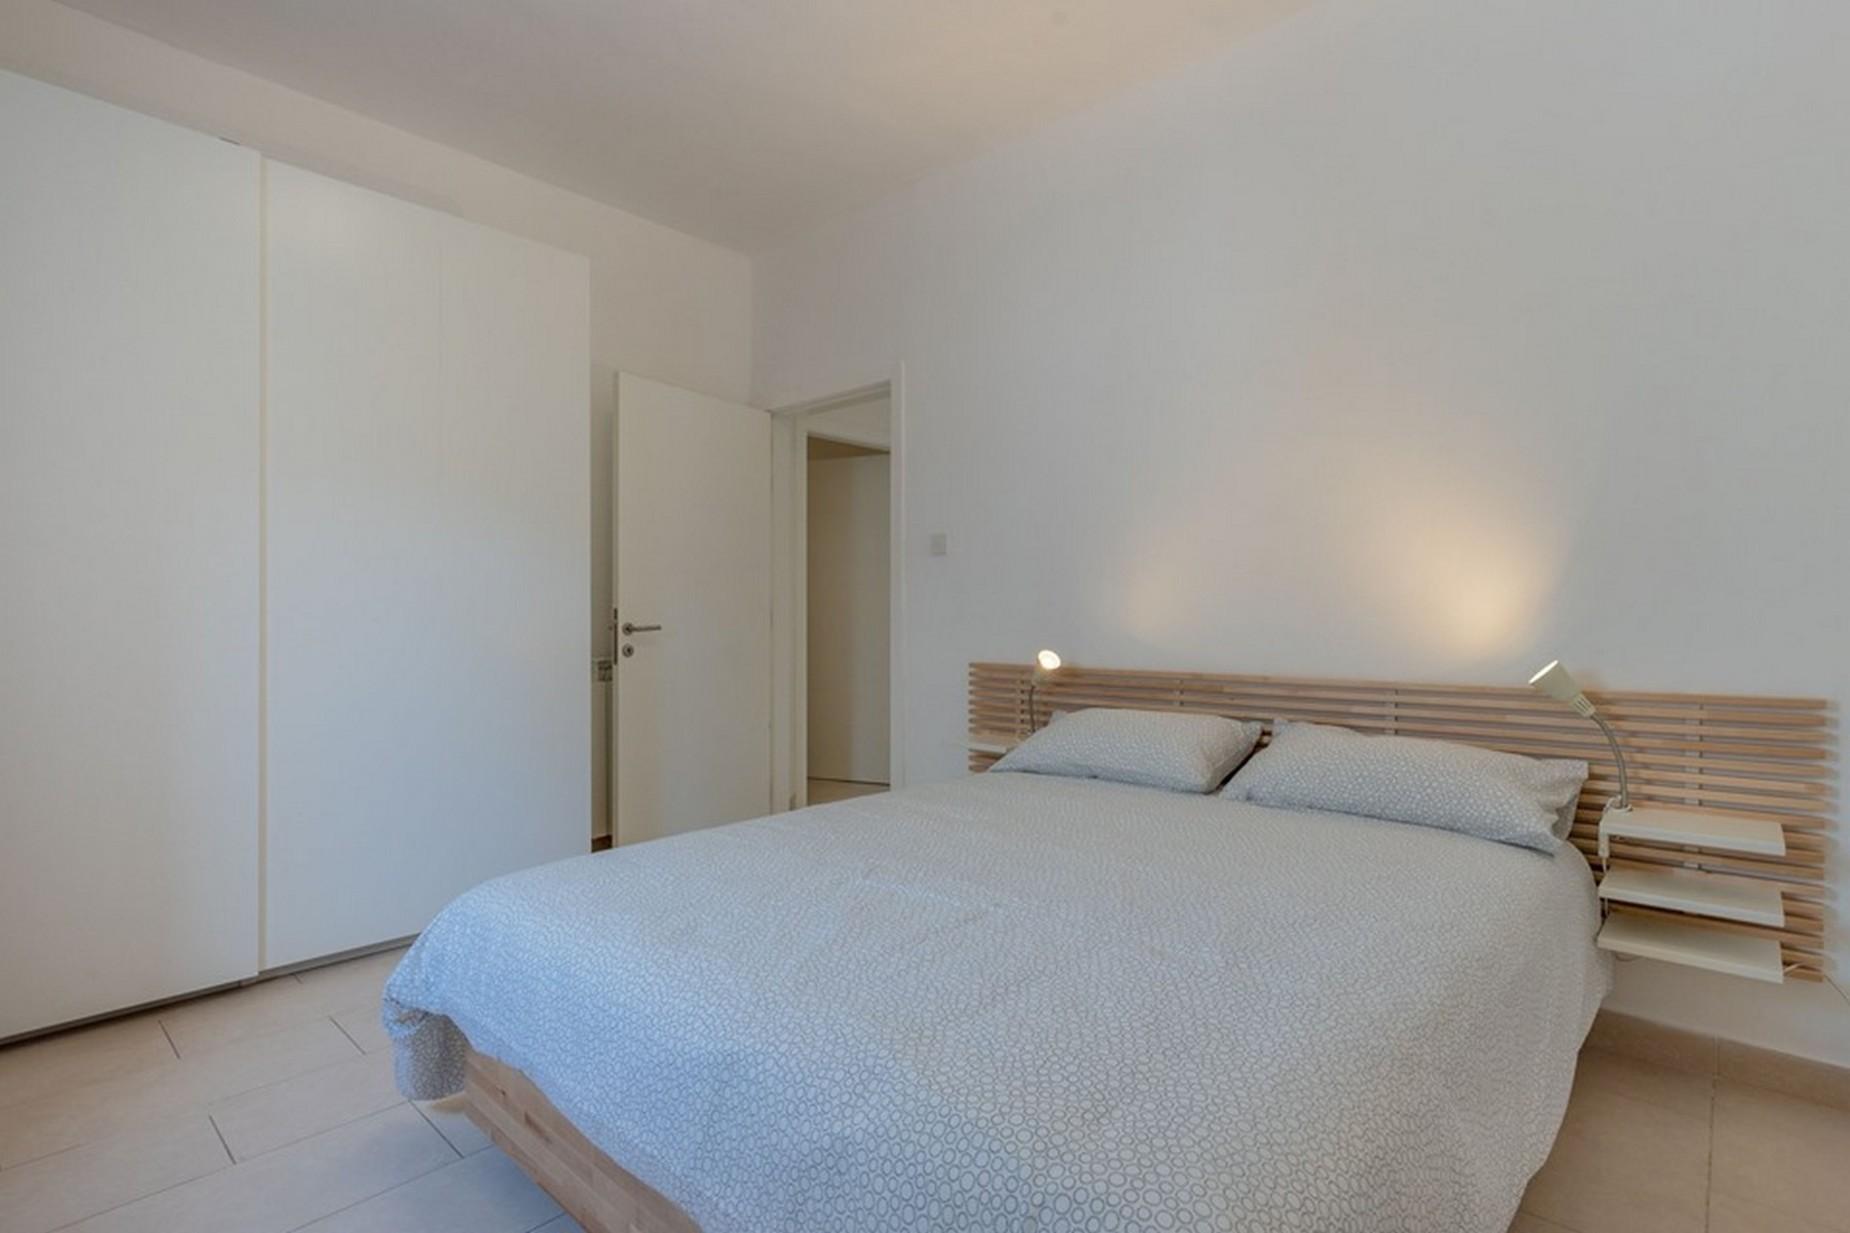 3 bed Maisonette For Rent in Ibragg, Ibragg - thumb 6